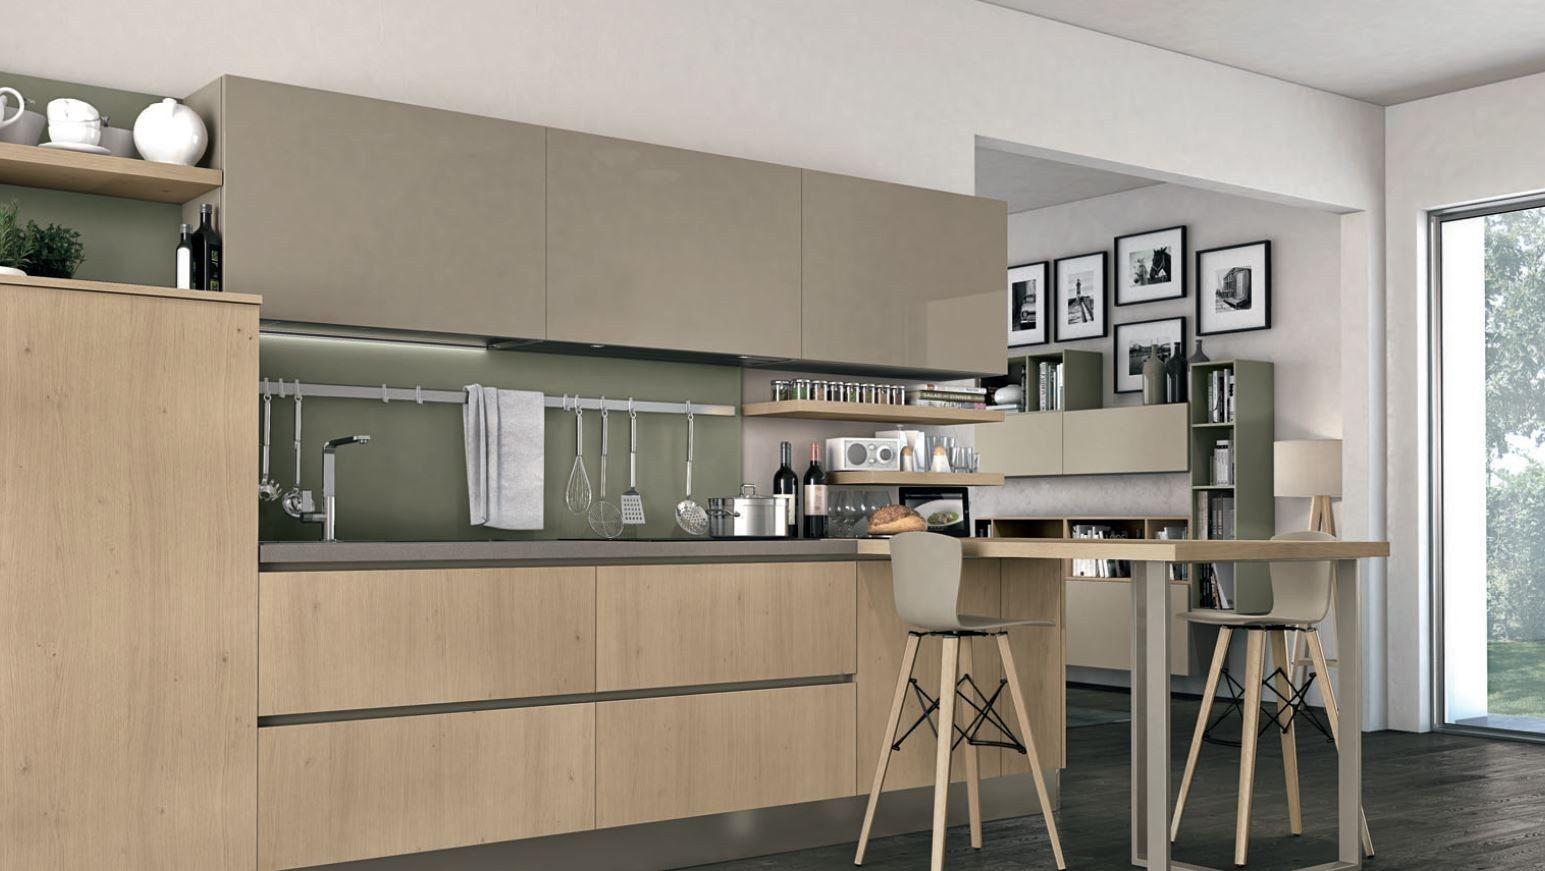 Wood Veneer Fitted Kitchen Clover 04 By Cucine Lube Kitchen Fittings Fitted Kitchen Designs Kitchen Design